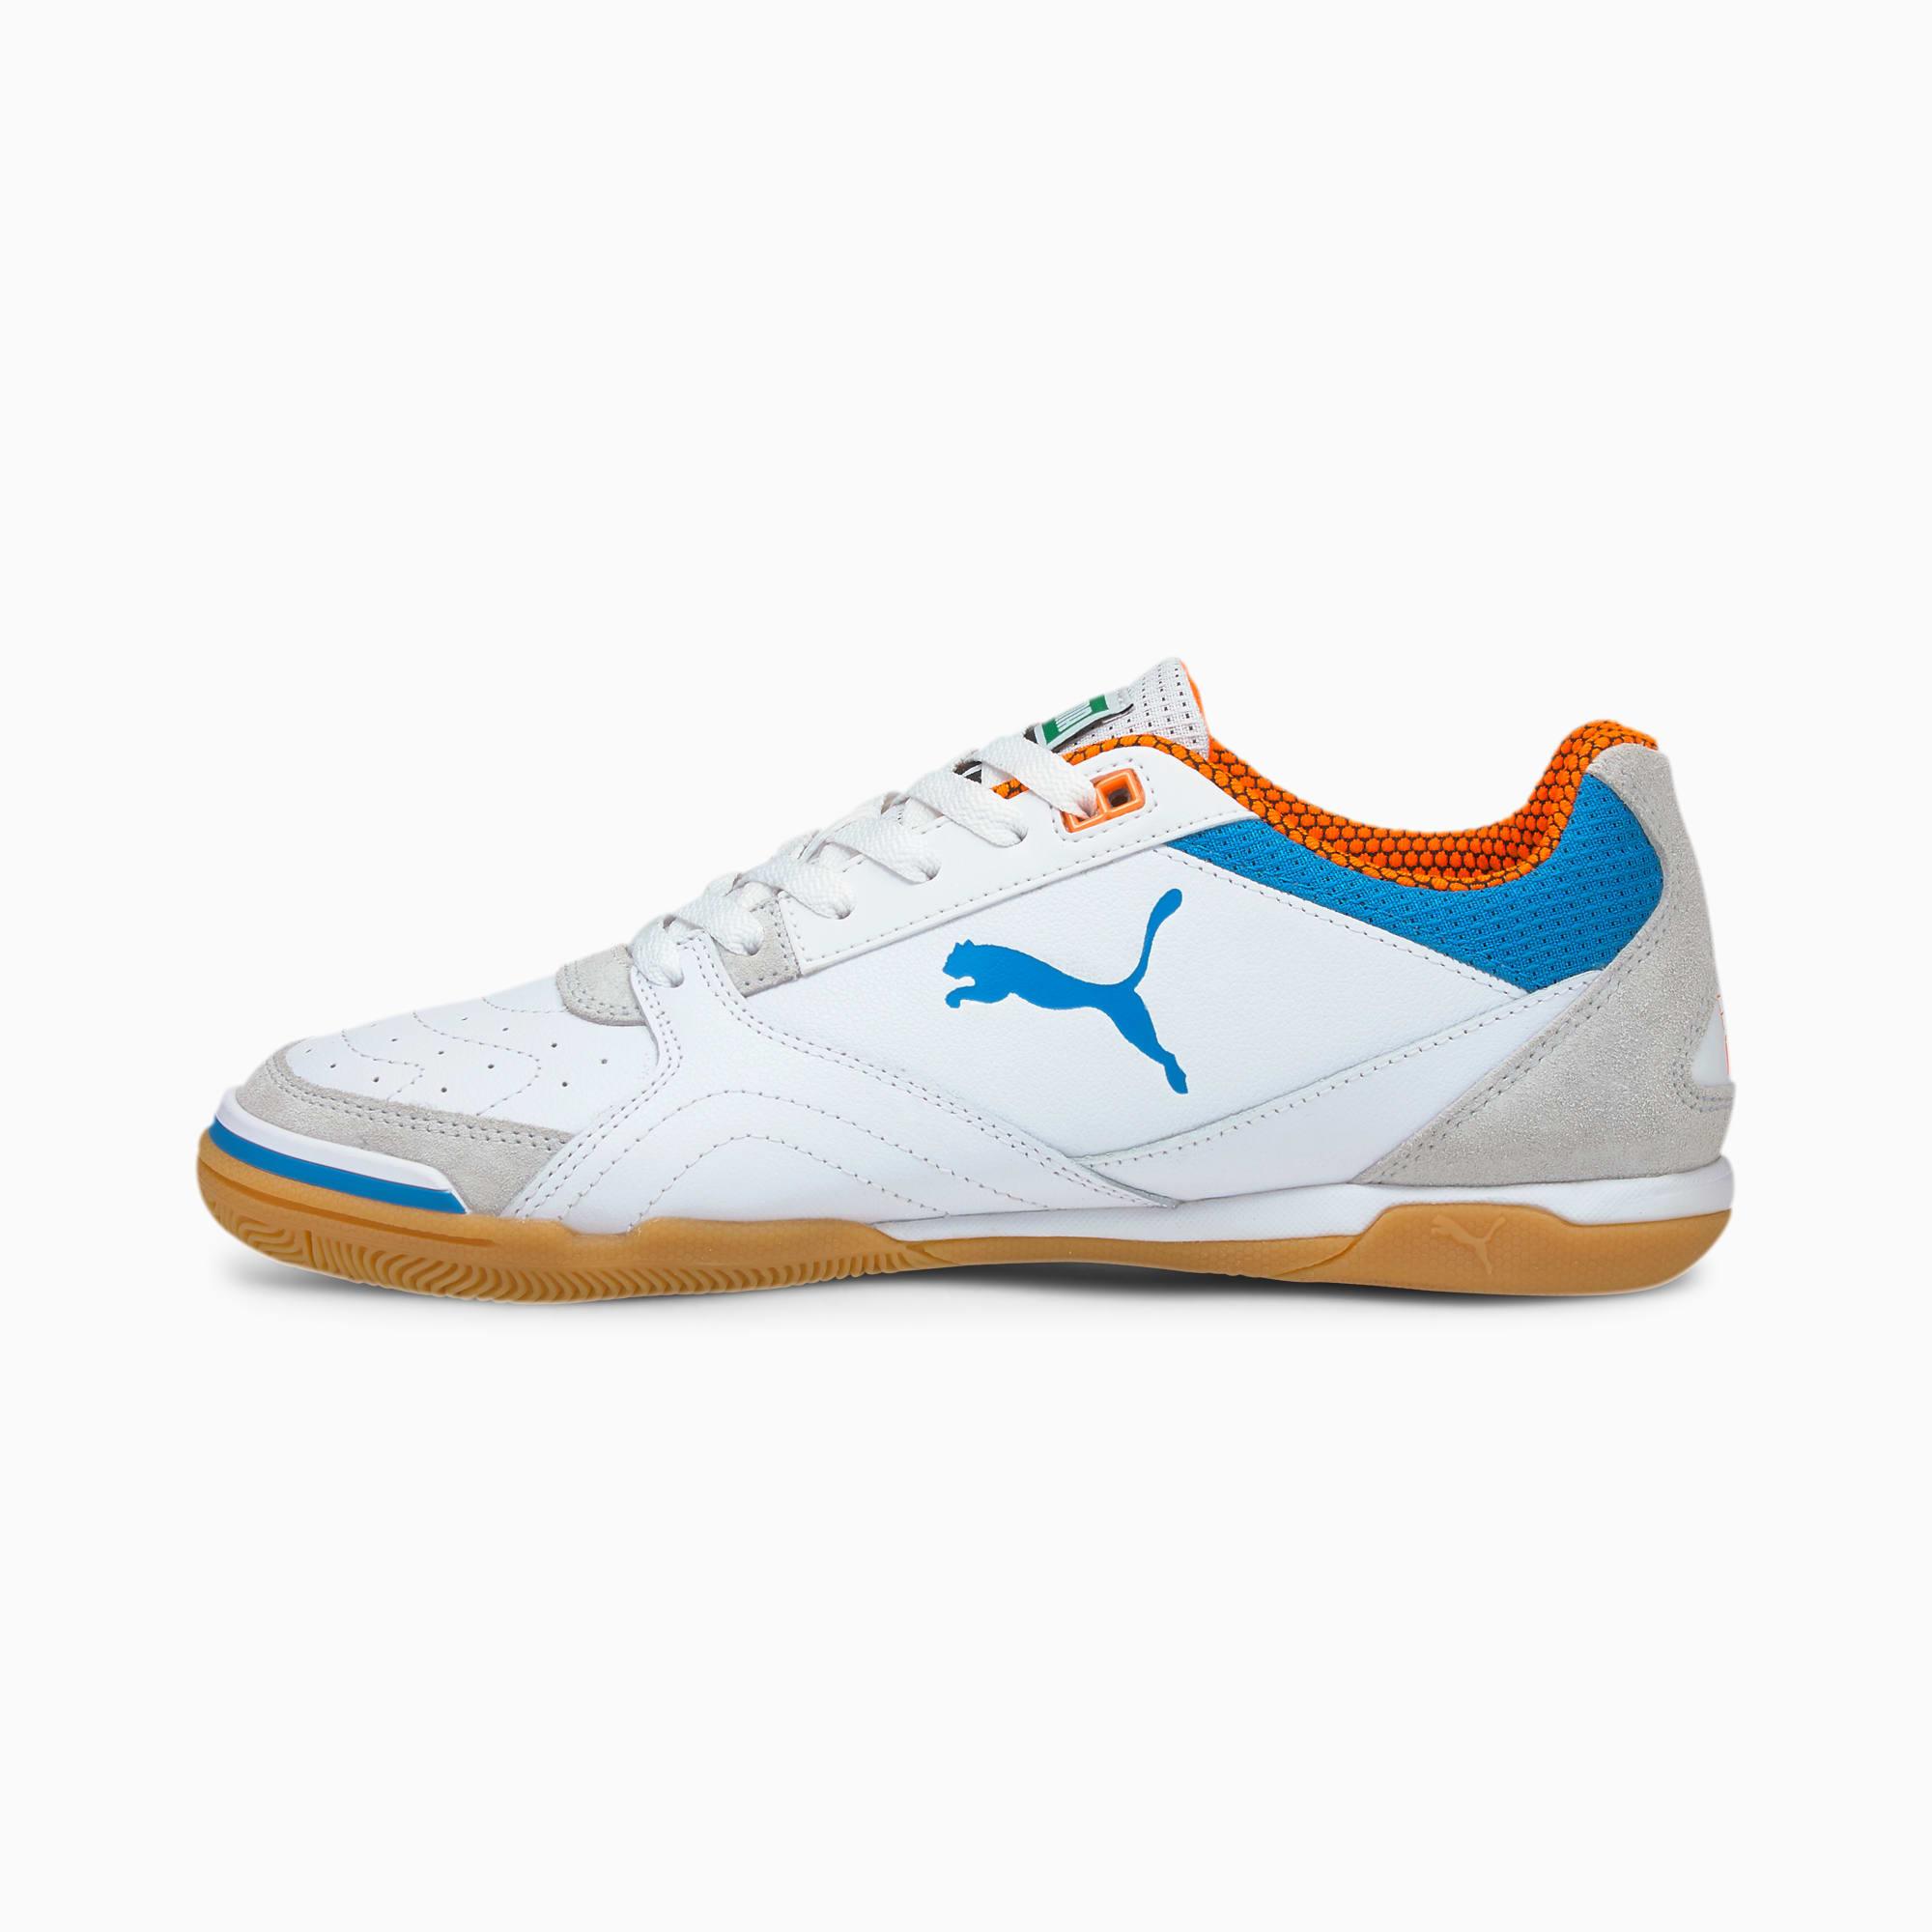 Chaussures de futsal Ibero, /Bleu/Blanc, Taille 40, Chaussures - PUMA - Modalova